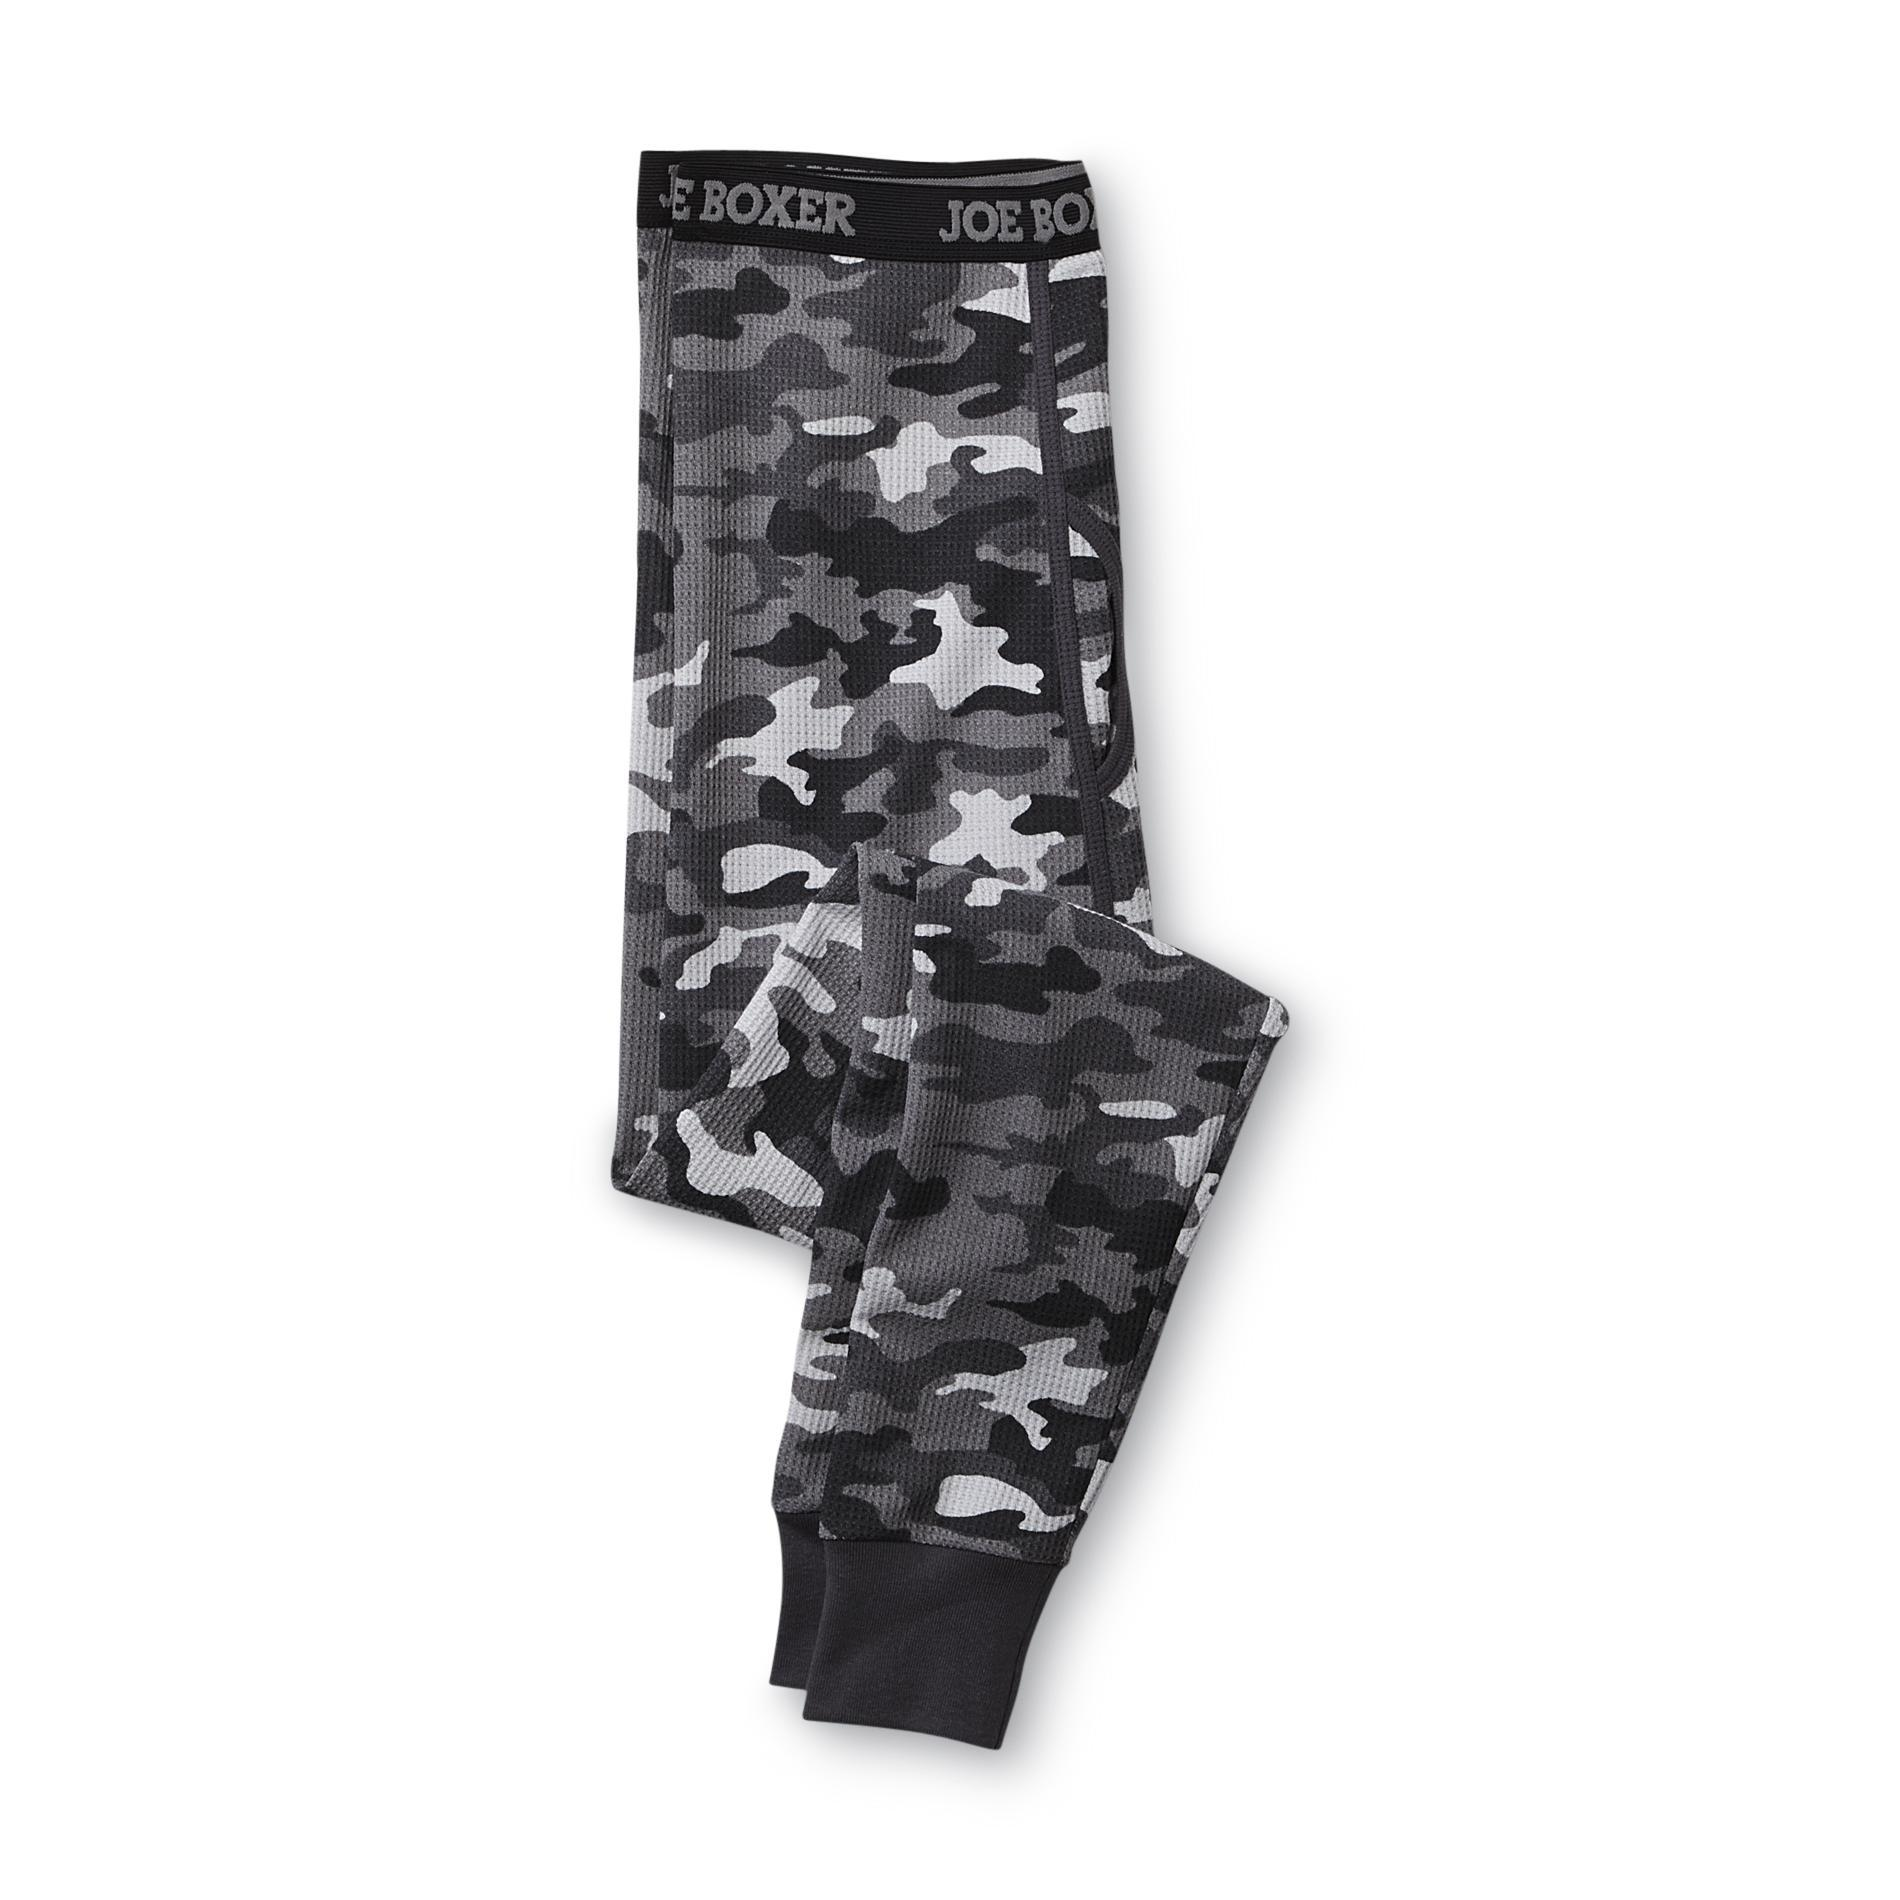 Joe Boxer Men' Camouflage Thermal Long Underwear